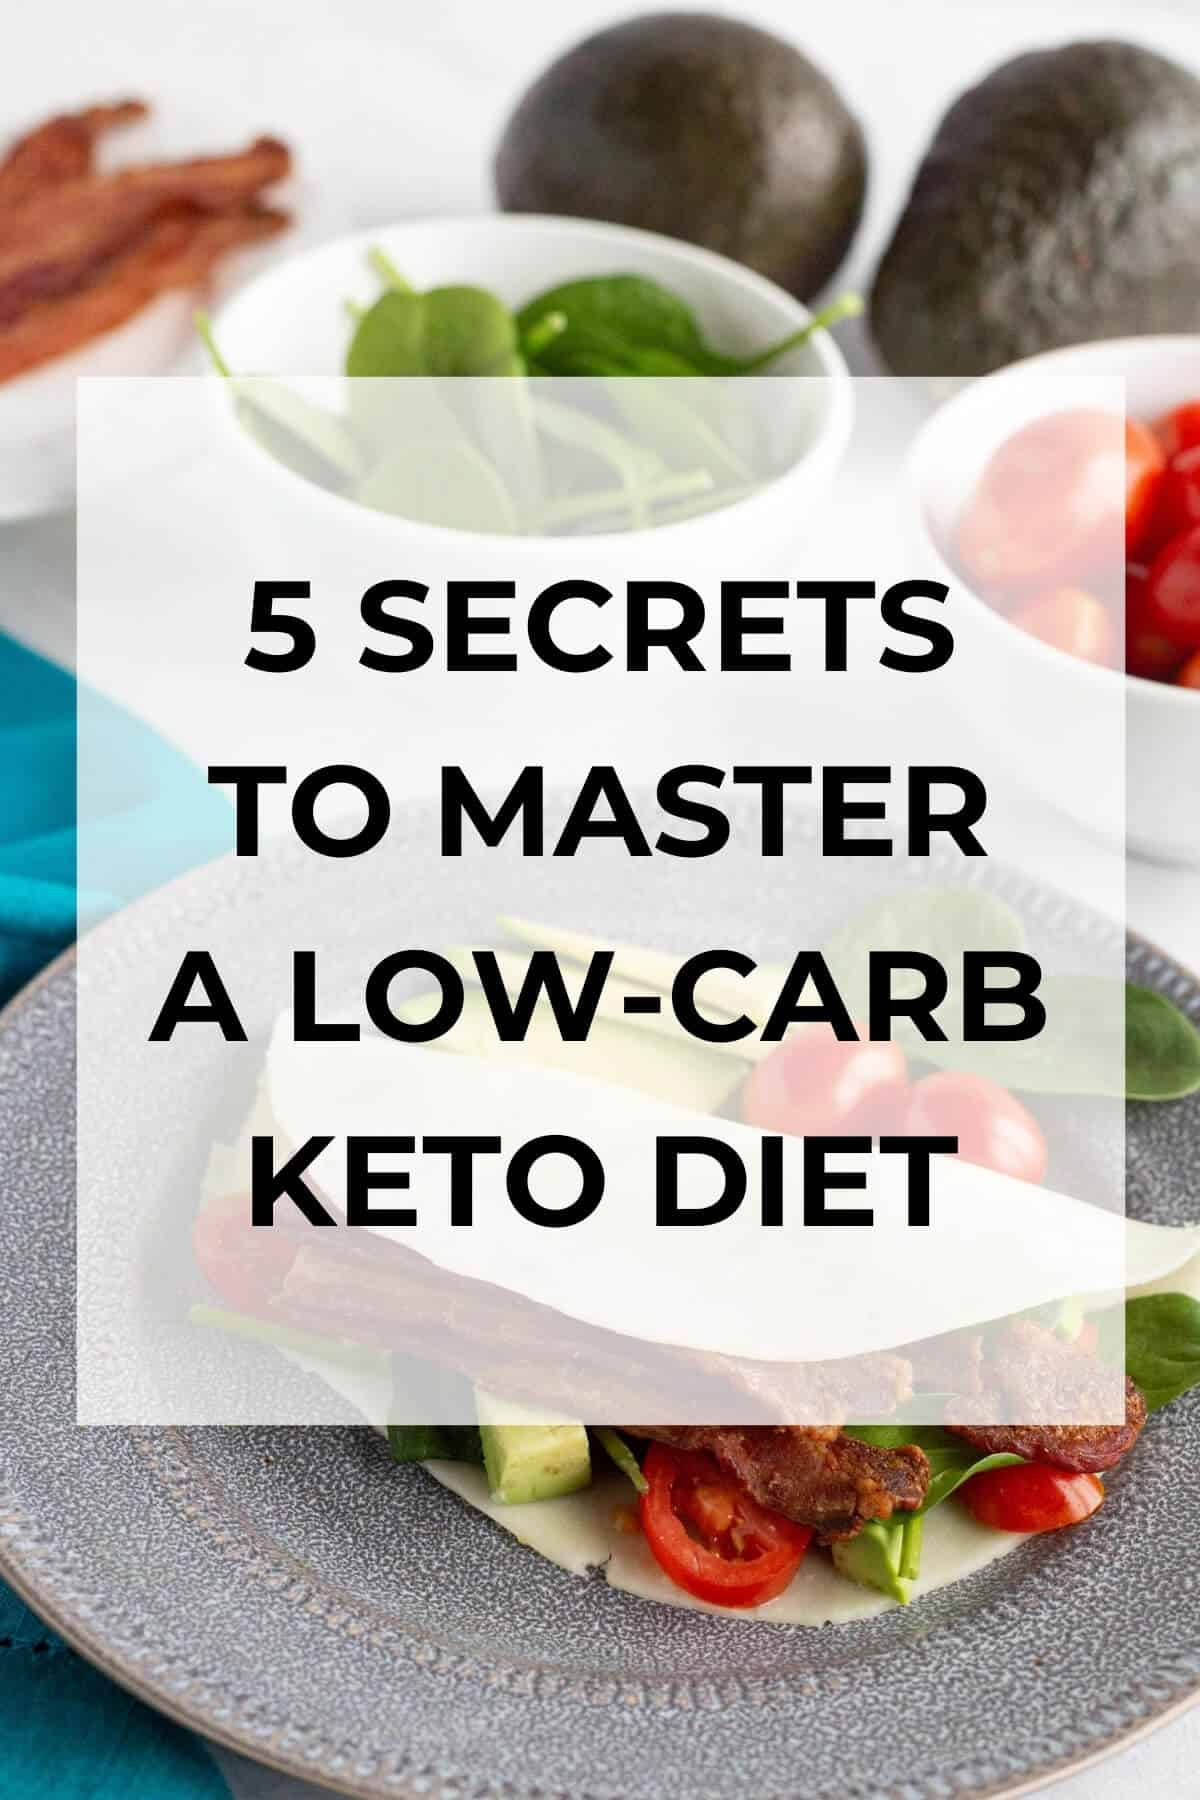 best tips to master keto diet